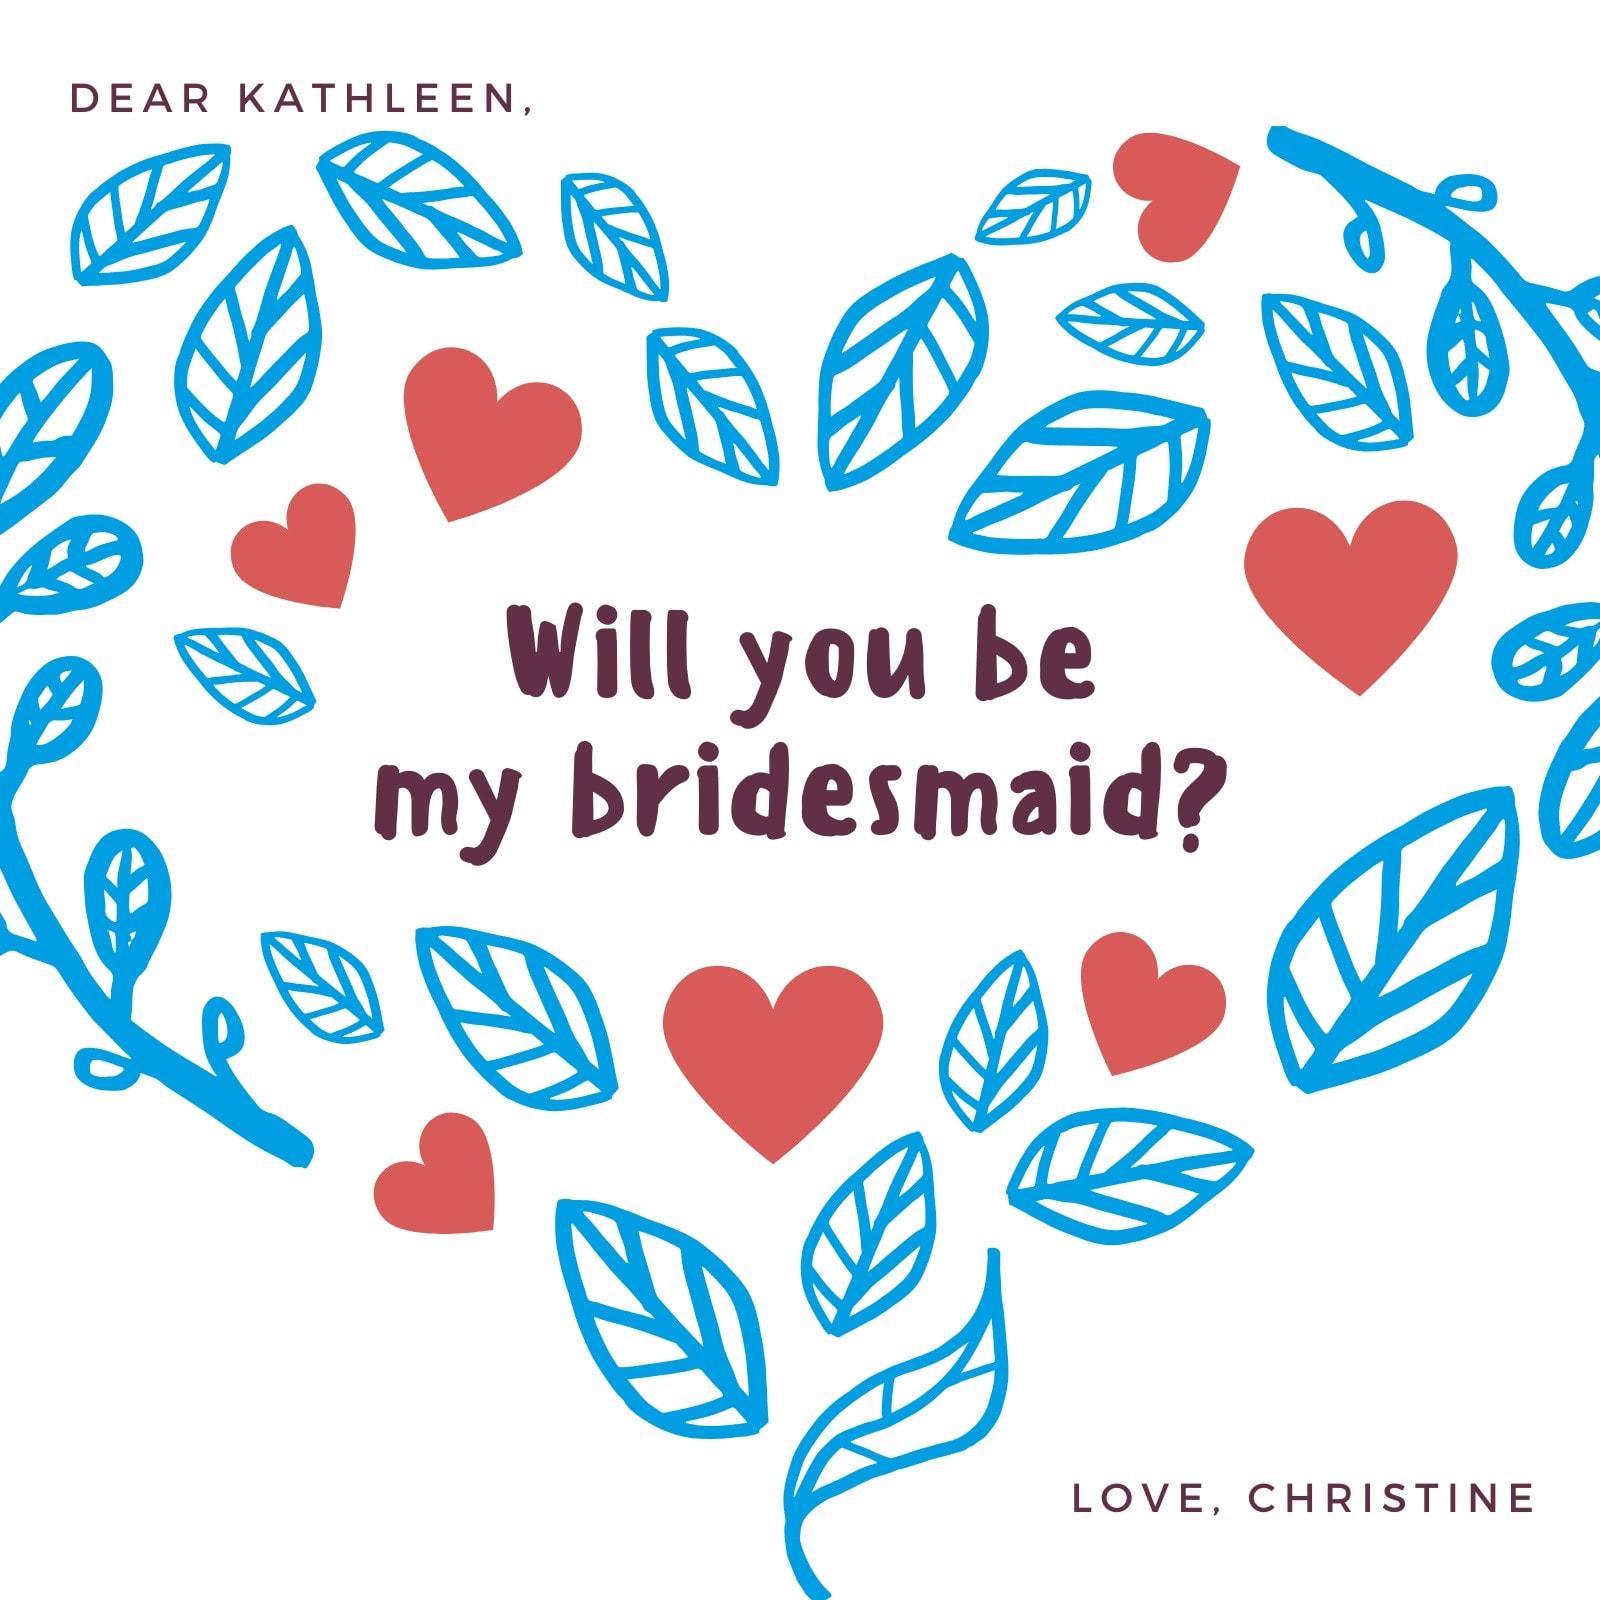 Heart Leaf collage Be My Bridesmaid - Invitation